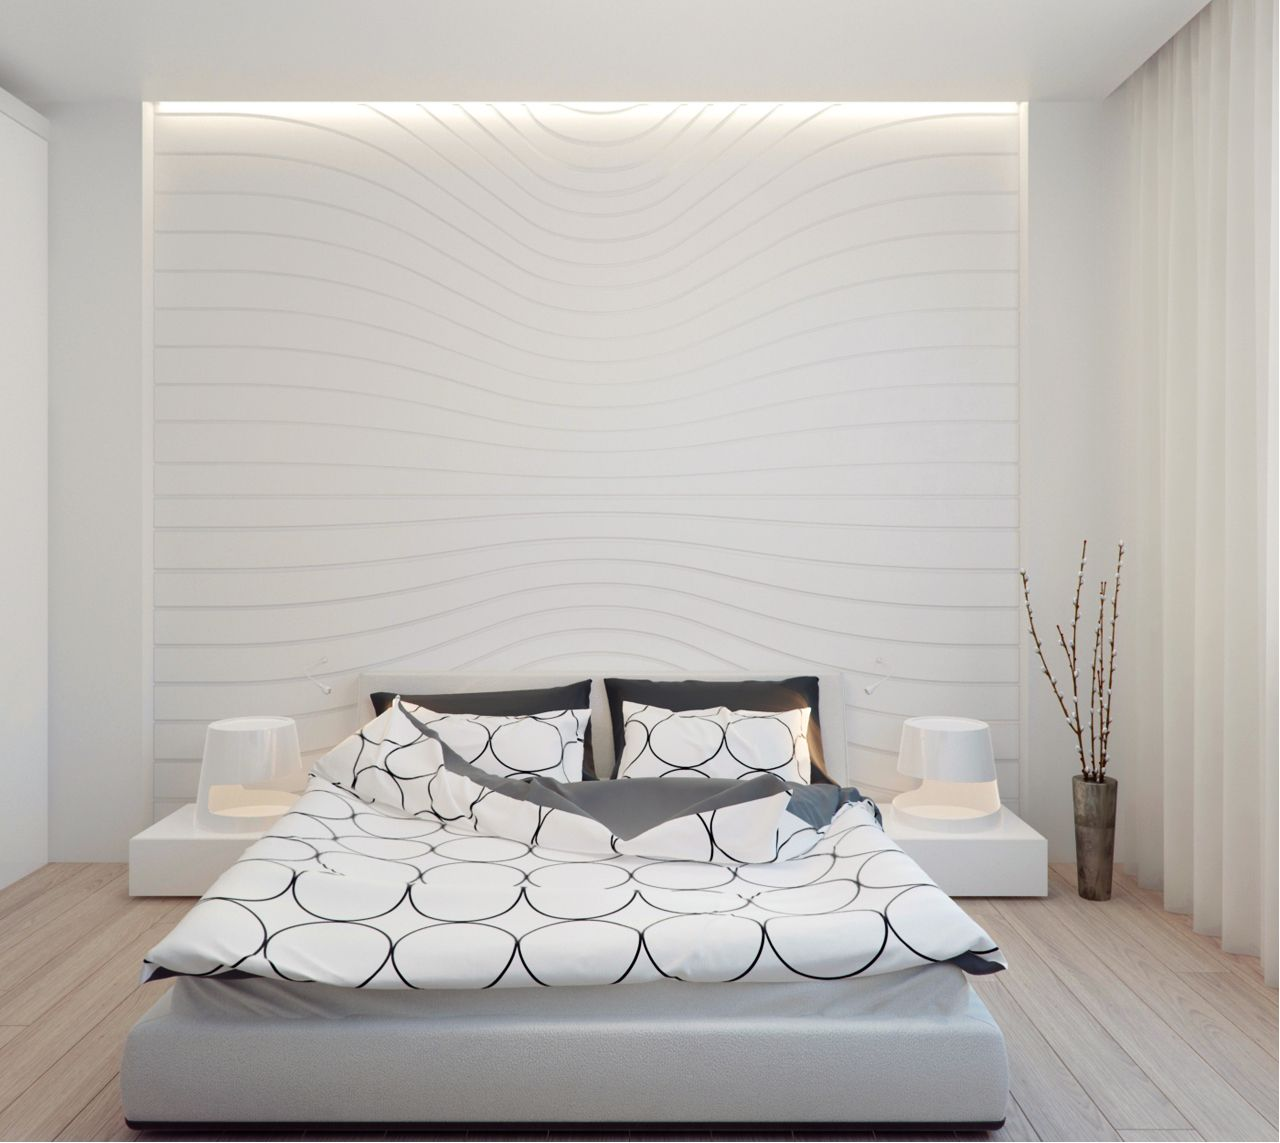 Квартира в Измайлово, Архитектурное бюро Александры Федоровой Minimalist Interior Design